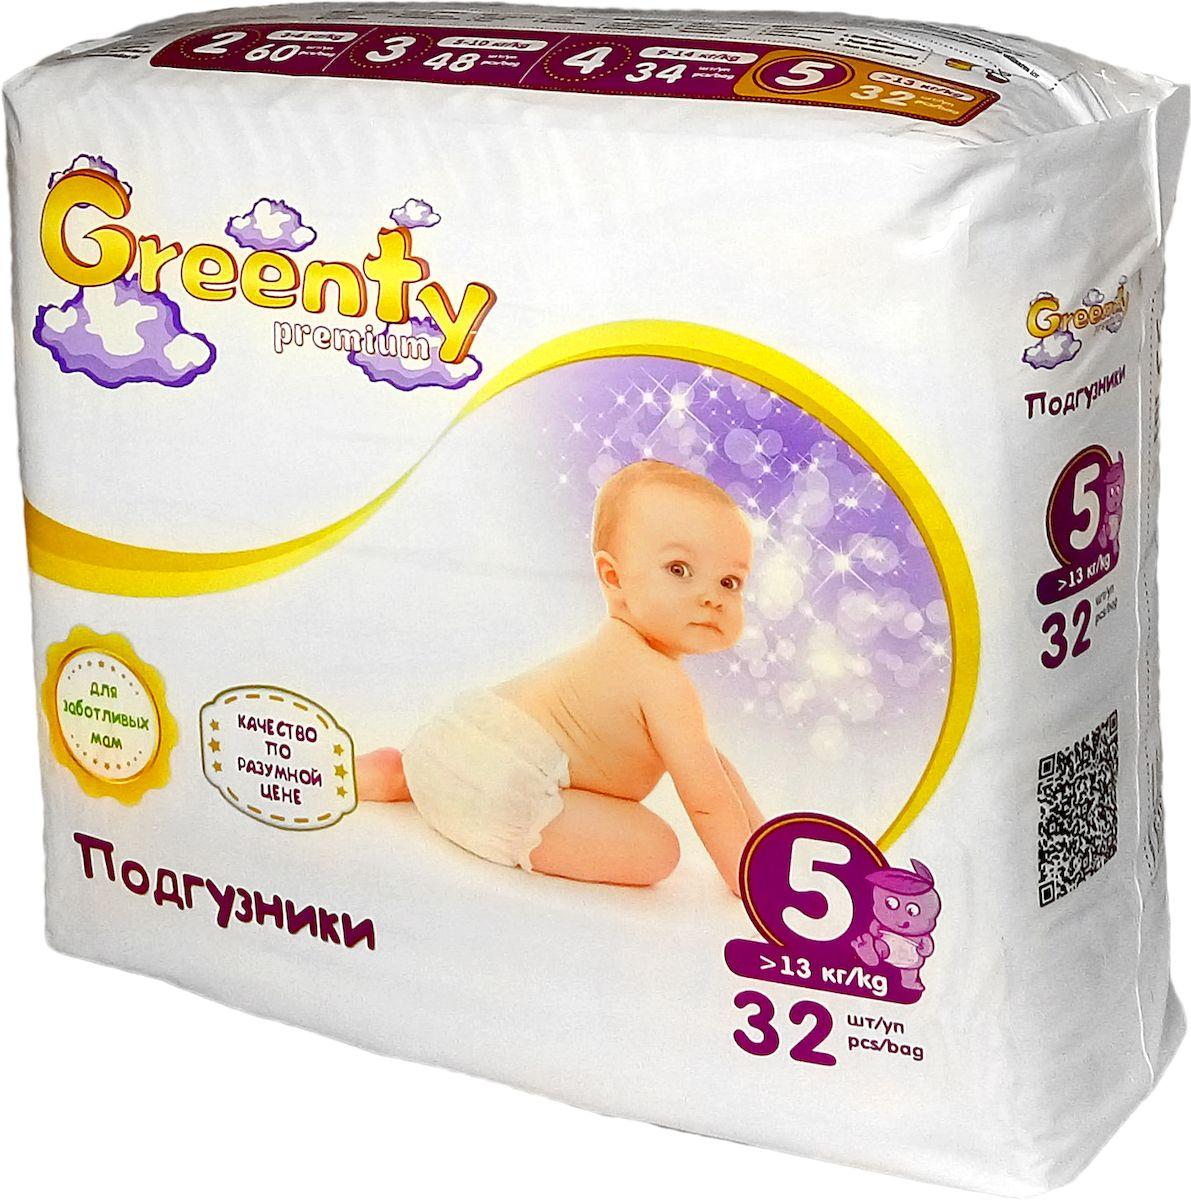 Greenty Подгузники +13 кг 32 штGRE-PR-5mGREENTY Одноразовые детские подгузники +13 кг (размер 5) 32 шт